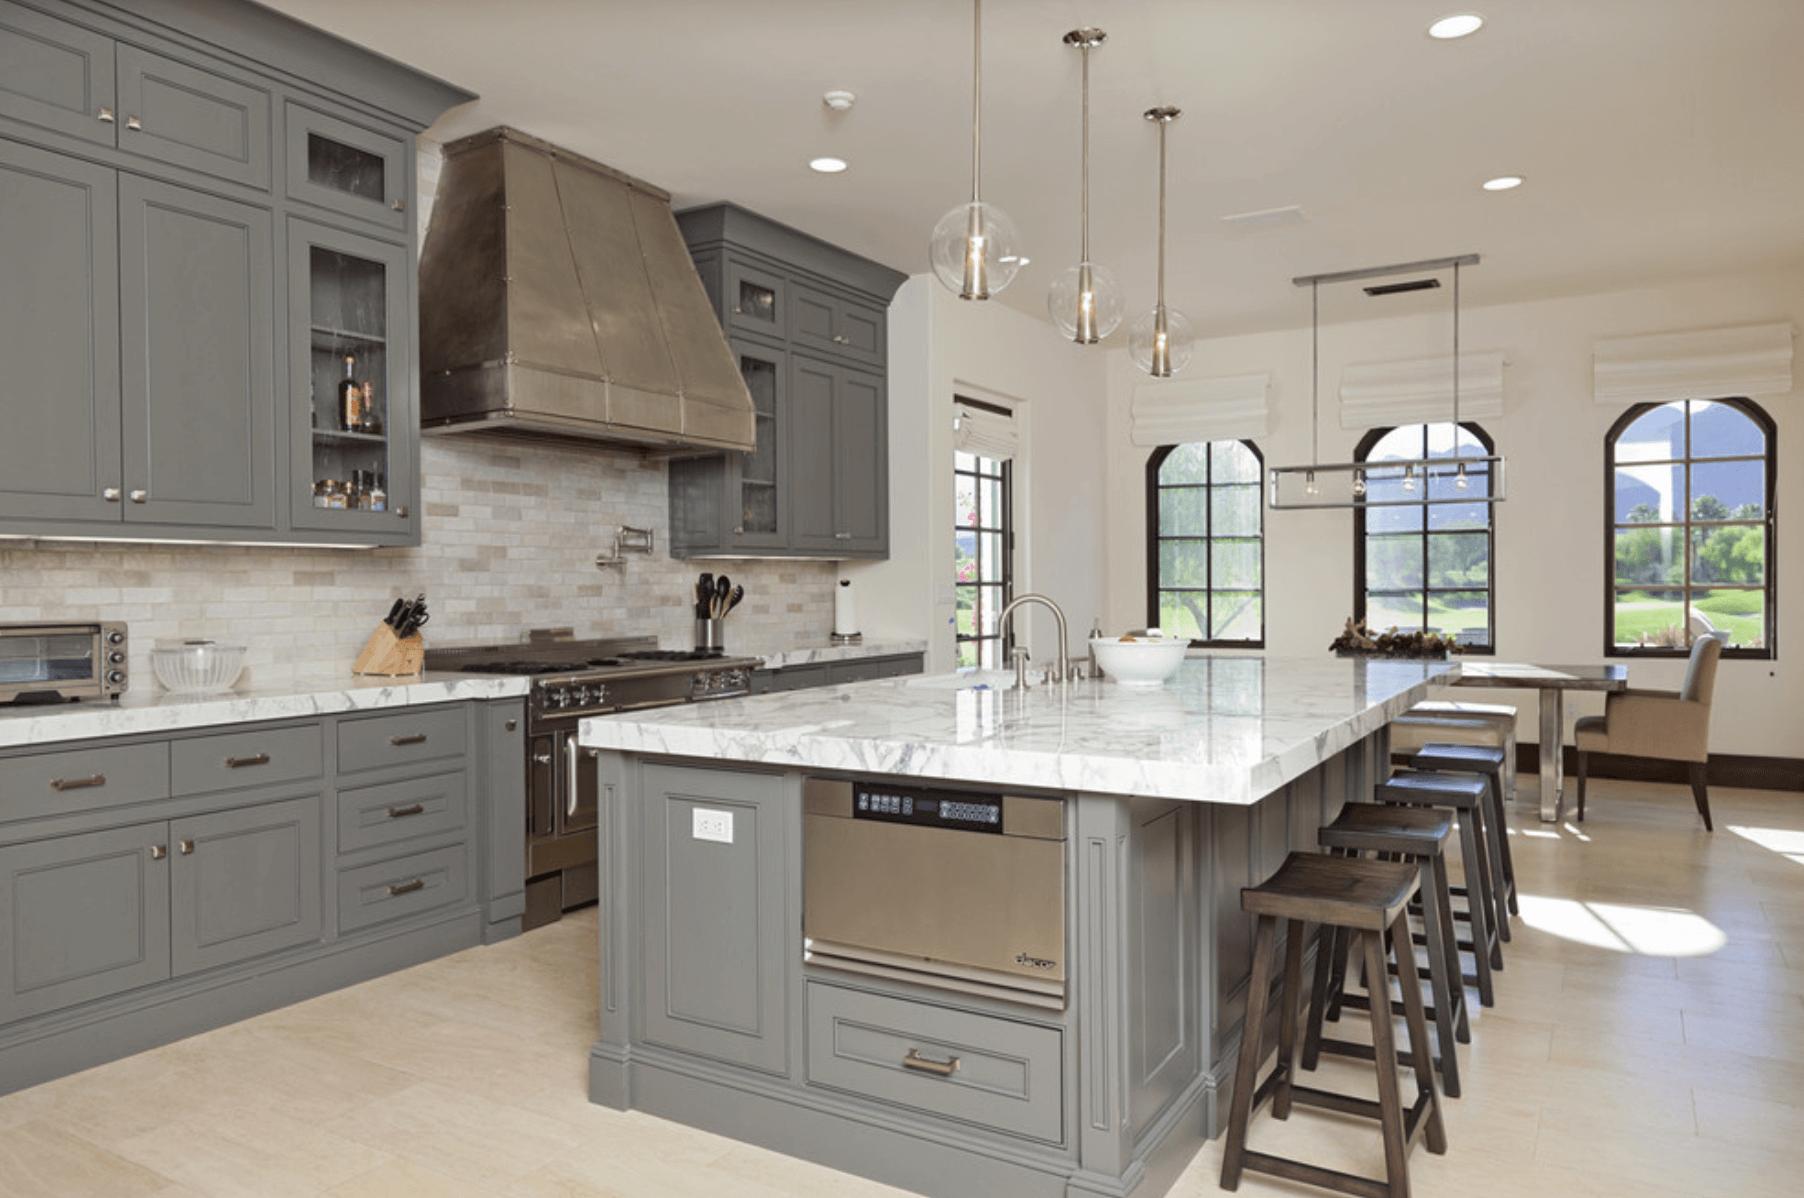 Kitchen Color Ideas Freshome Grey Kitchen Designs Kitchen Island With Seating Grey Kitchen Cabinets